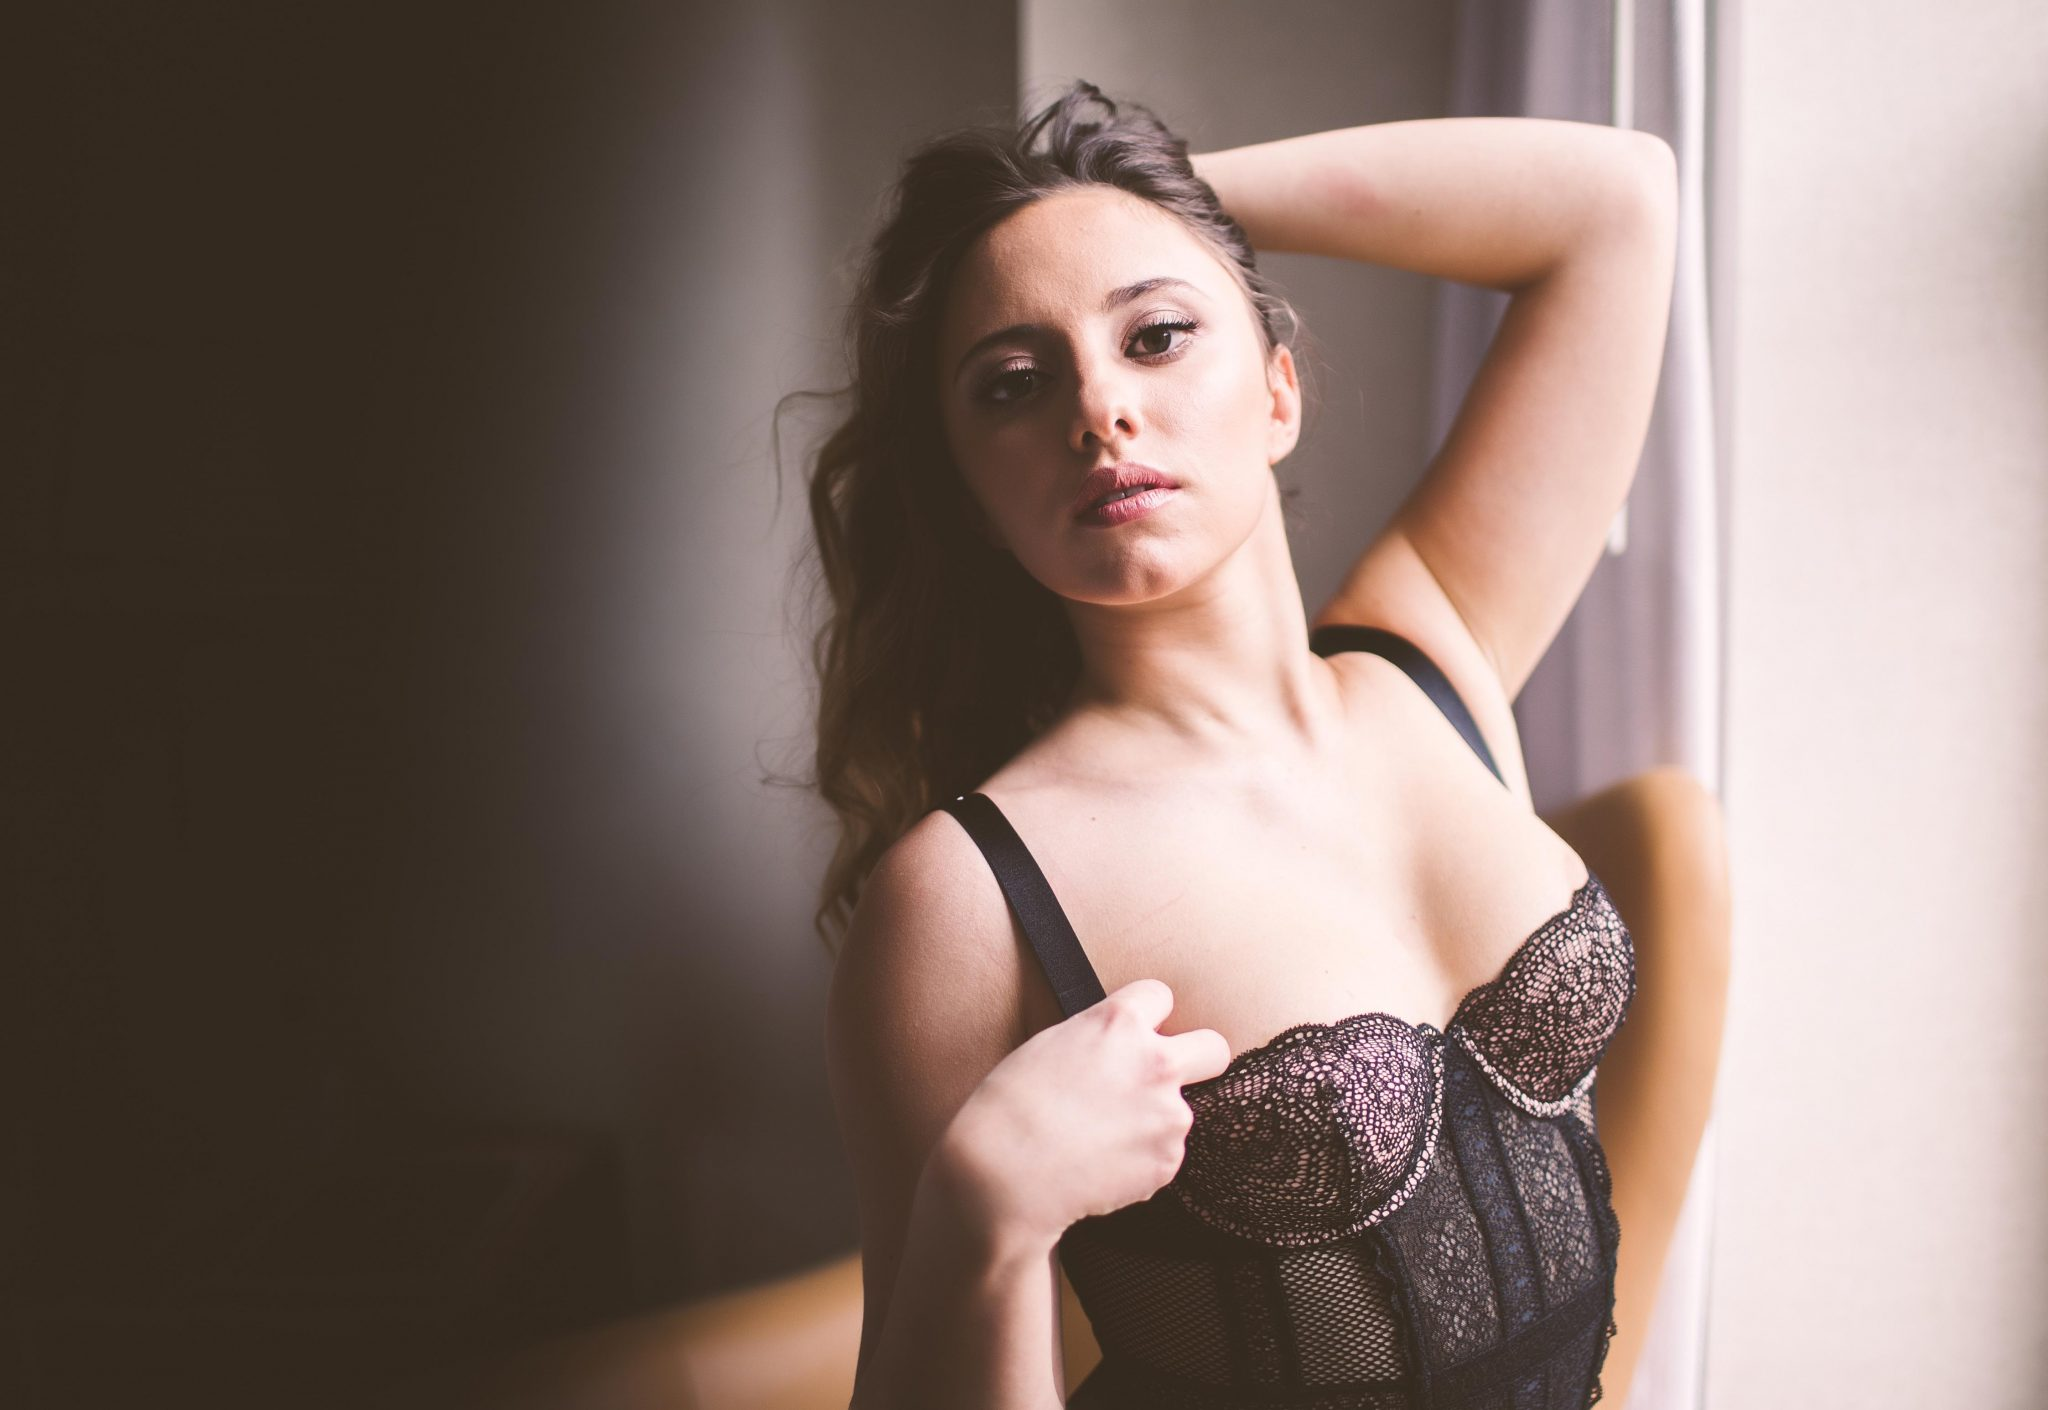 Image URL: https://www.evgeniaribinik.com/wp-content/uploads/2017/02/NY-boudoir-photography-00101-1.jpg  Click to view this fusker